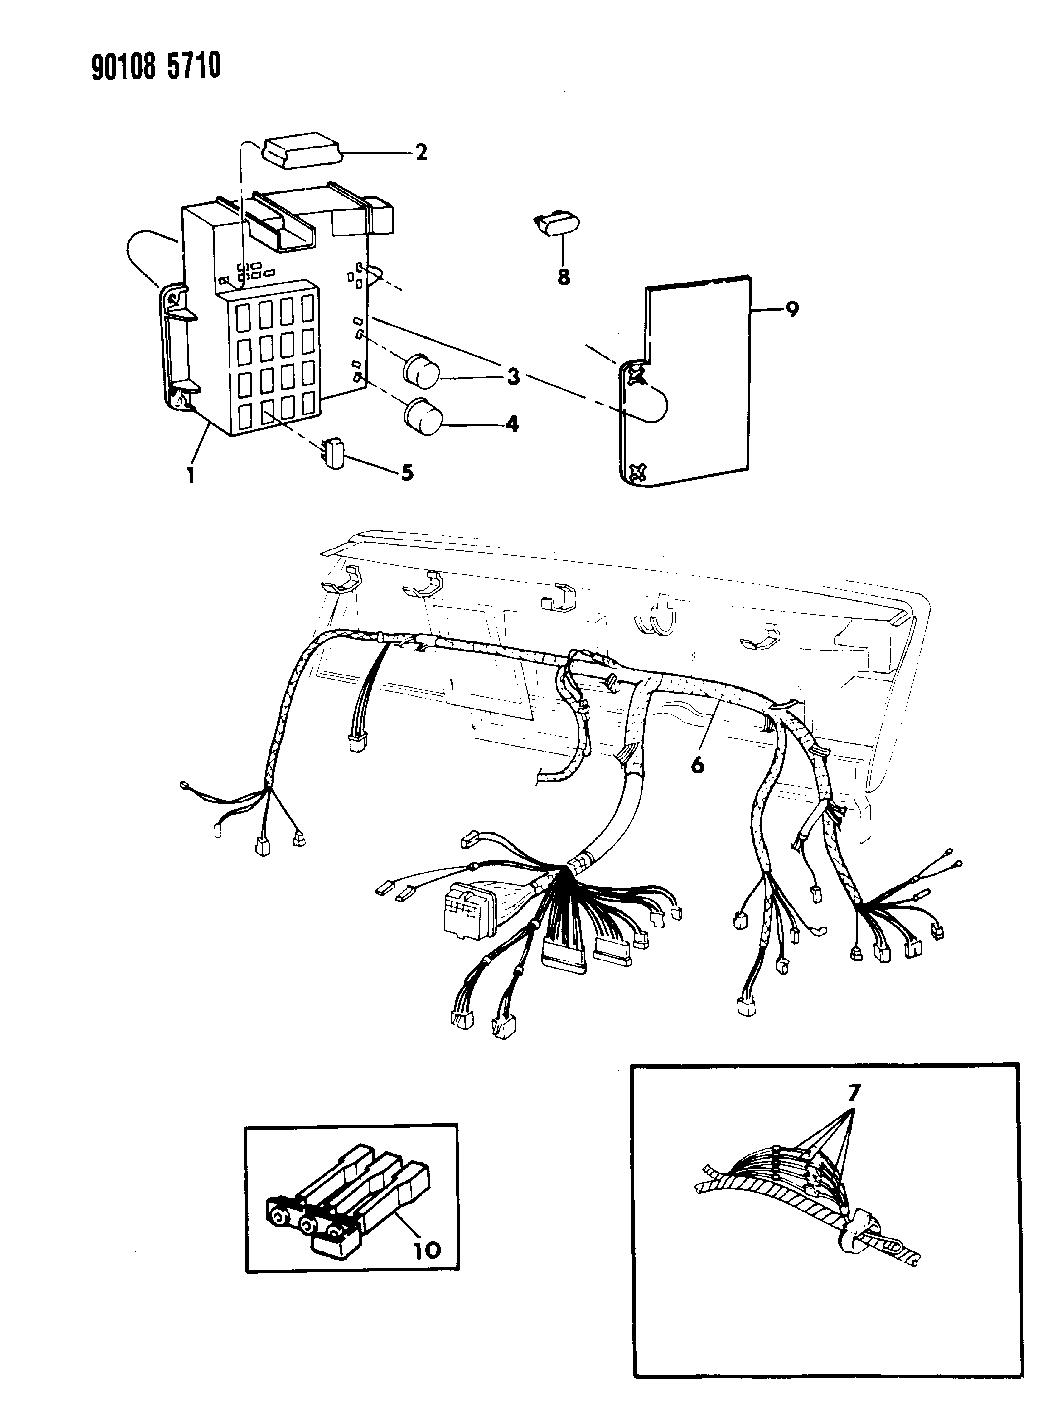 1990 Dodge Omni Wiring - Instrument Panel